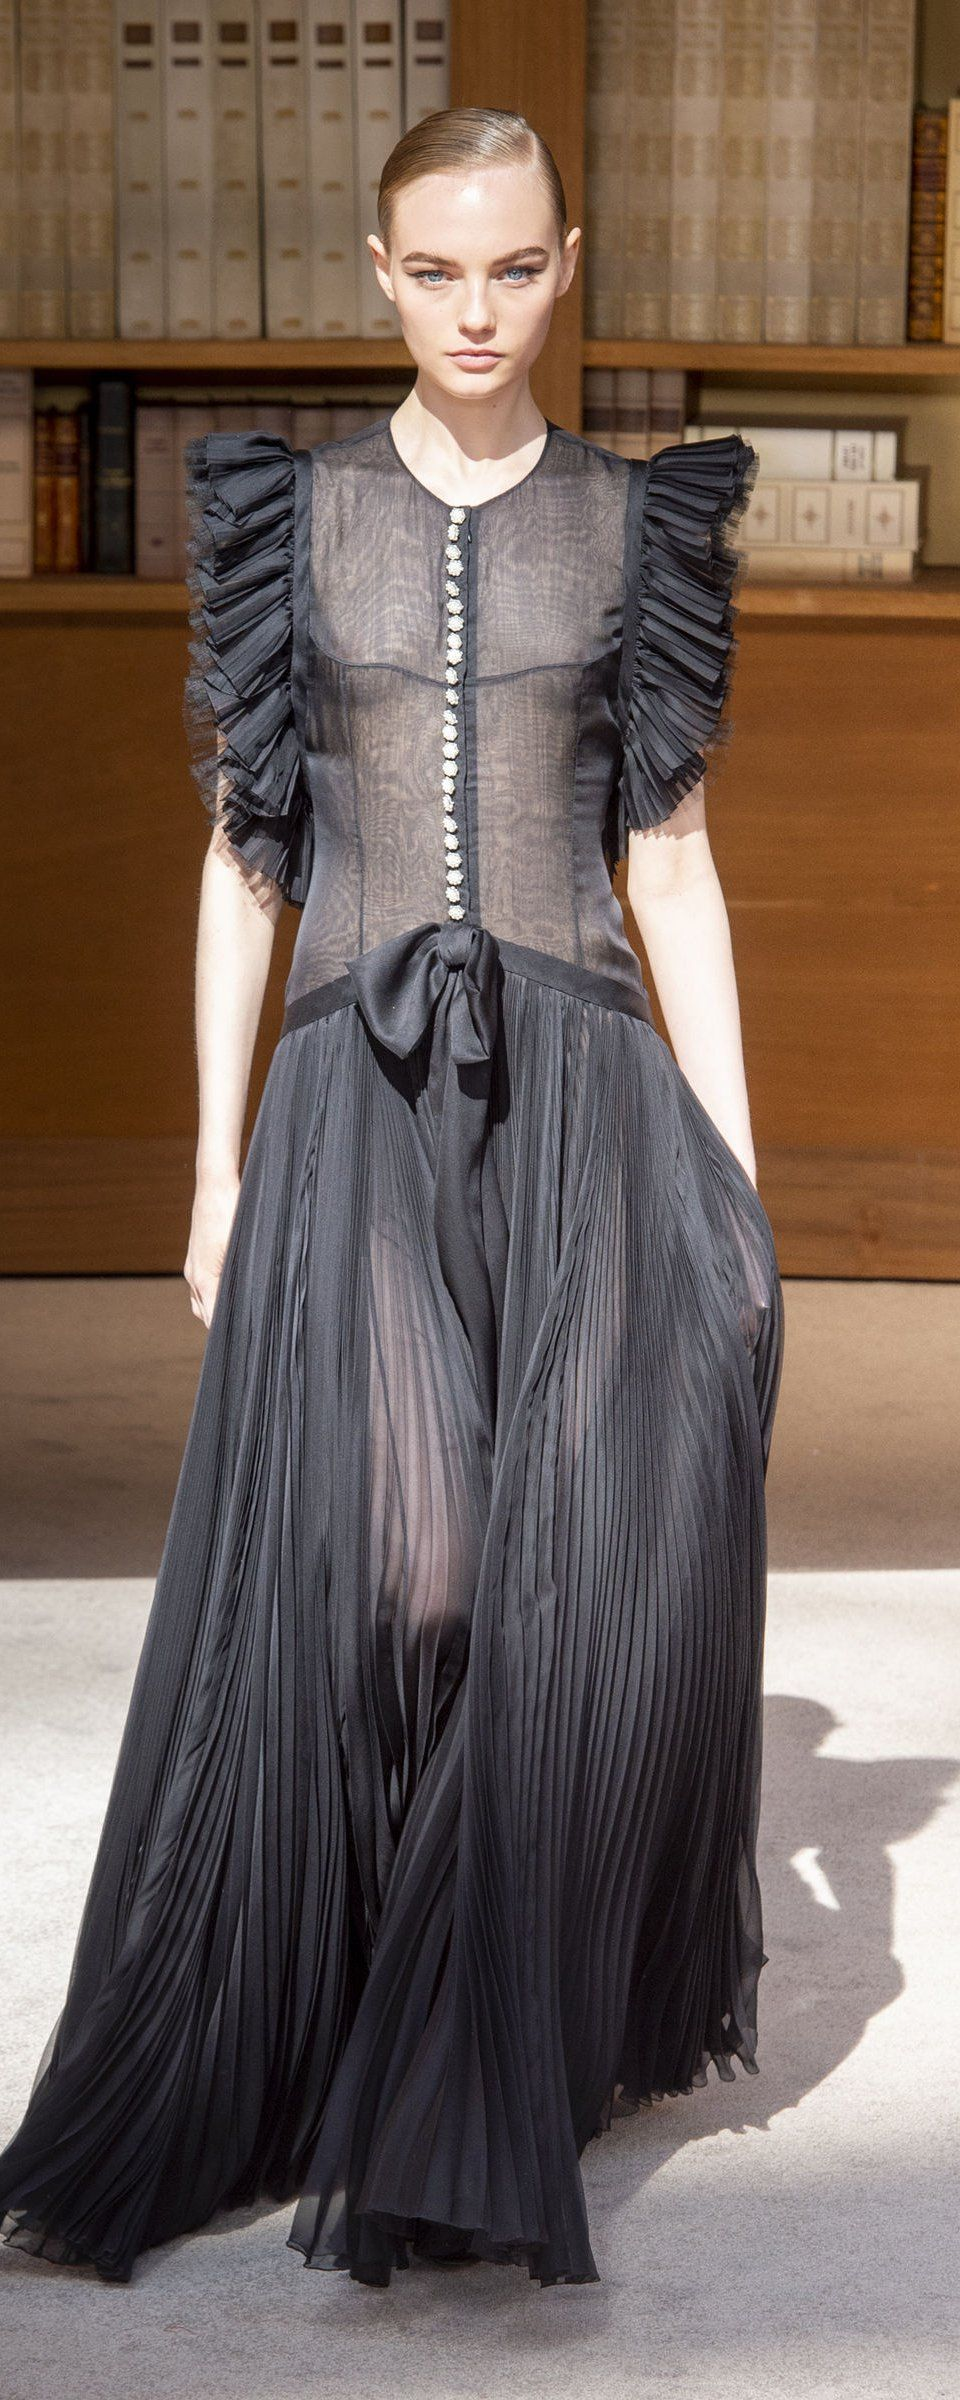 Chanel Fallwinter 20192020 Couture in 2020 Fashion